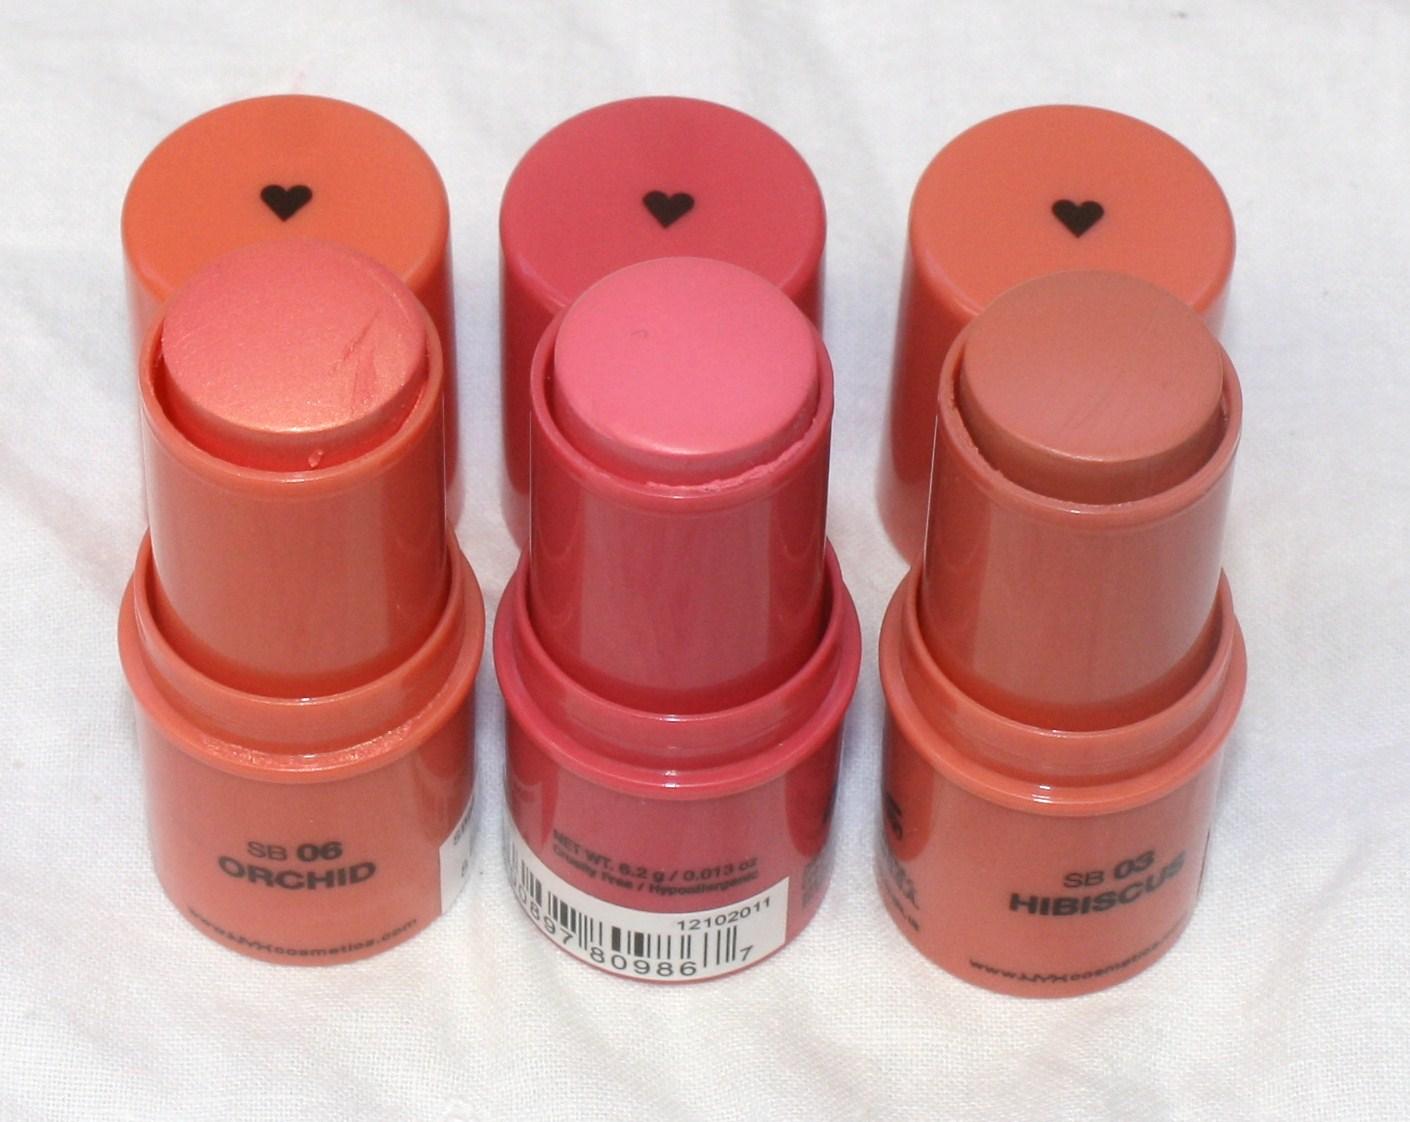 Miss Prissypants Nyx Stick Blush Farveprøver-4593